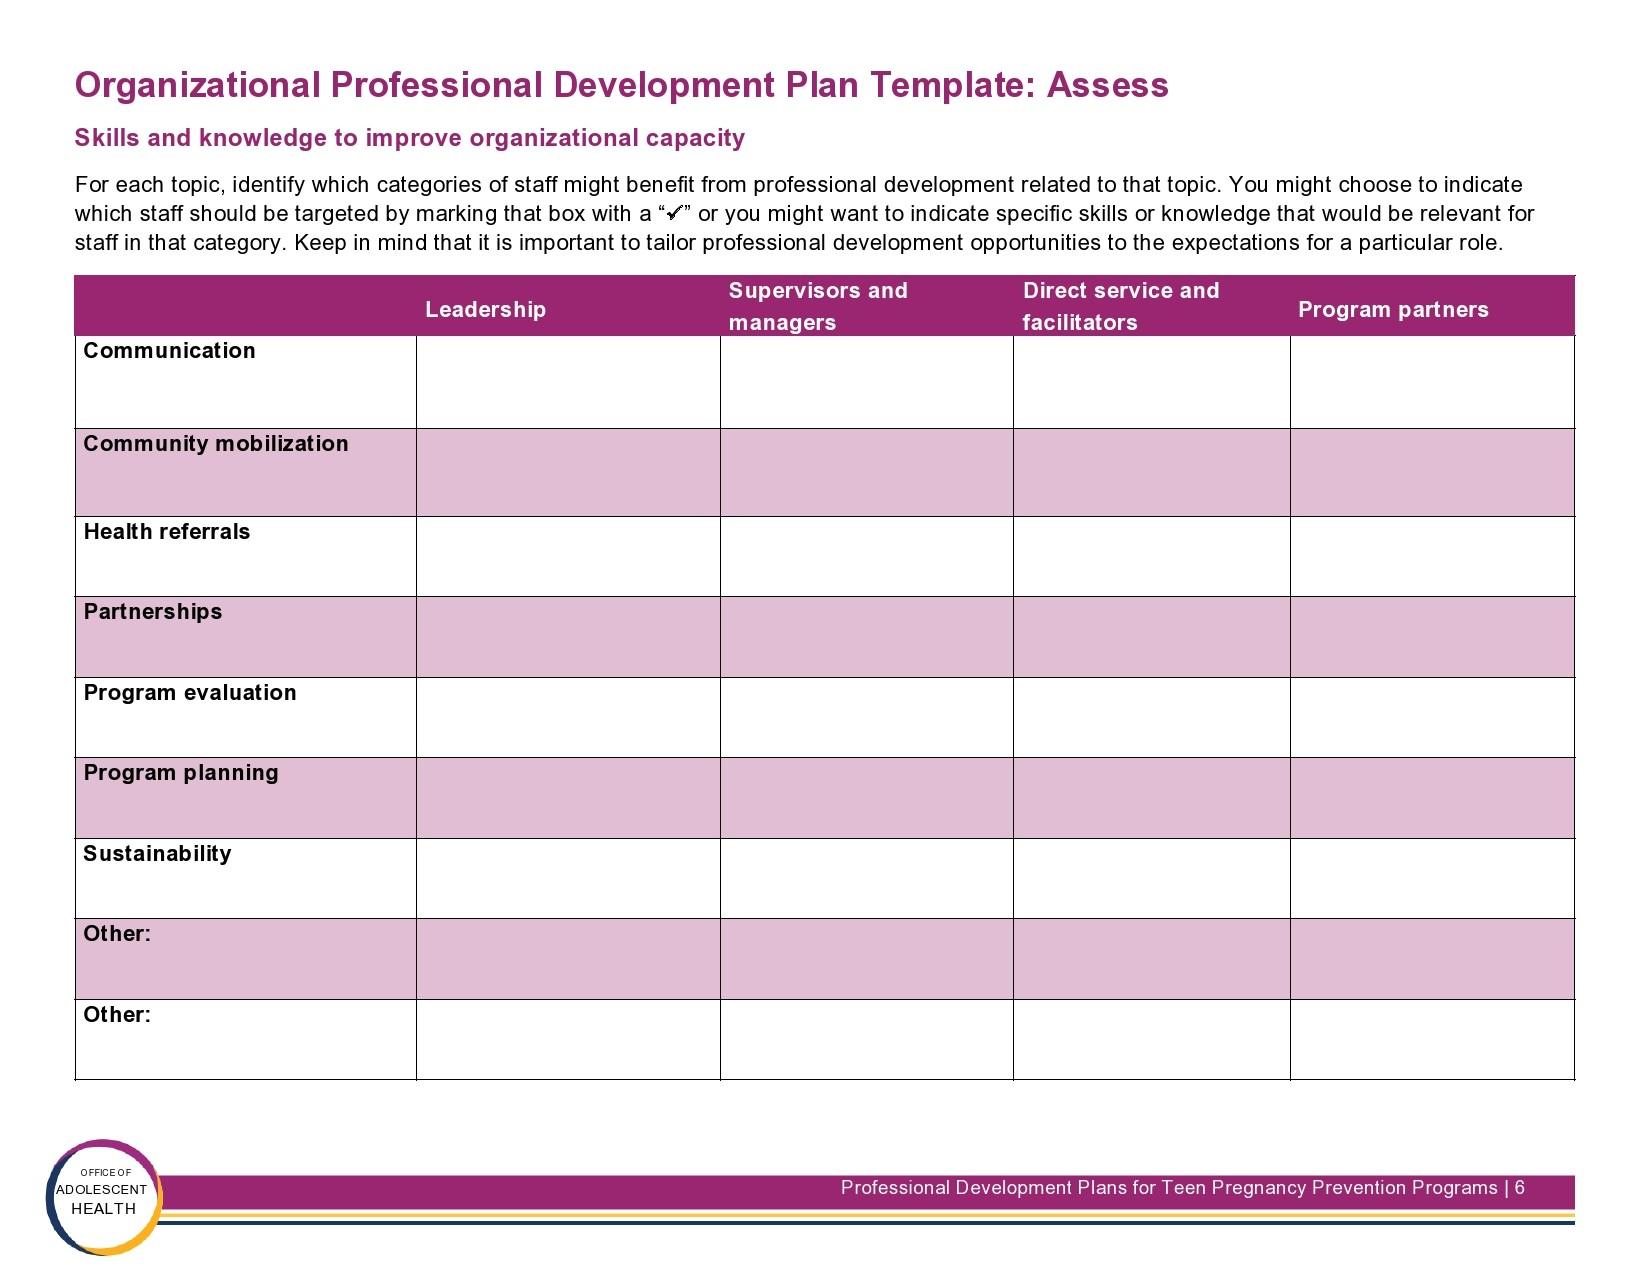 Free professional development plan 16